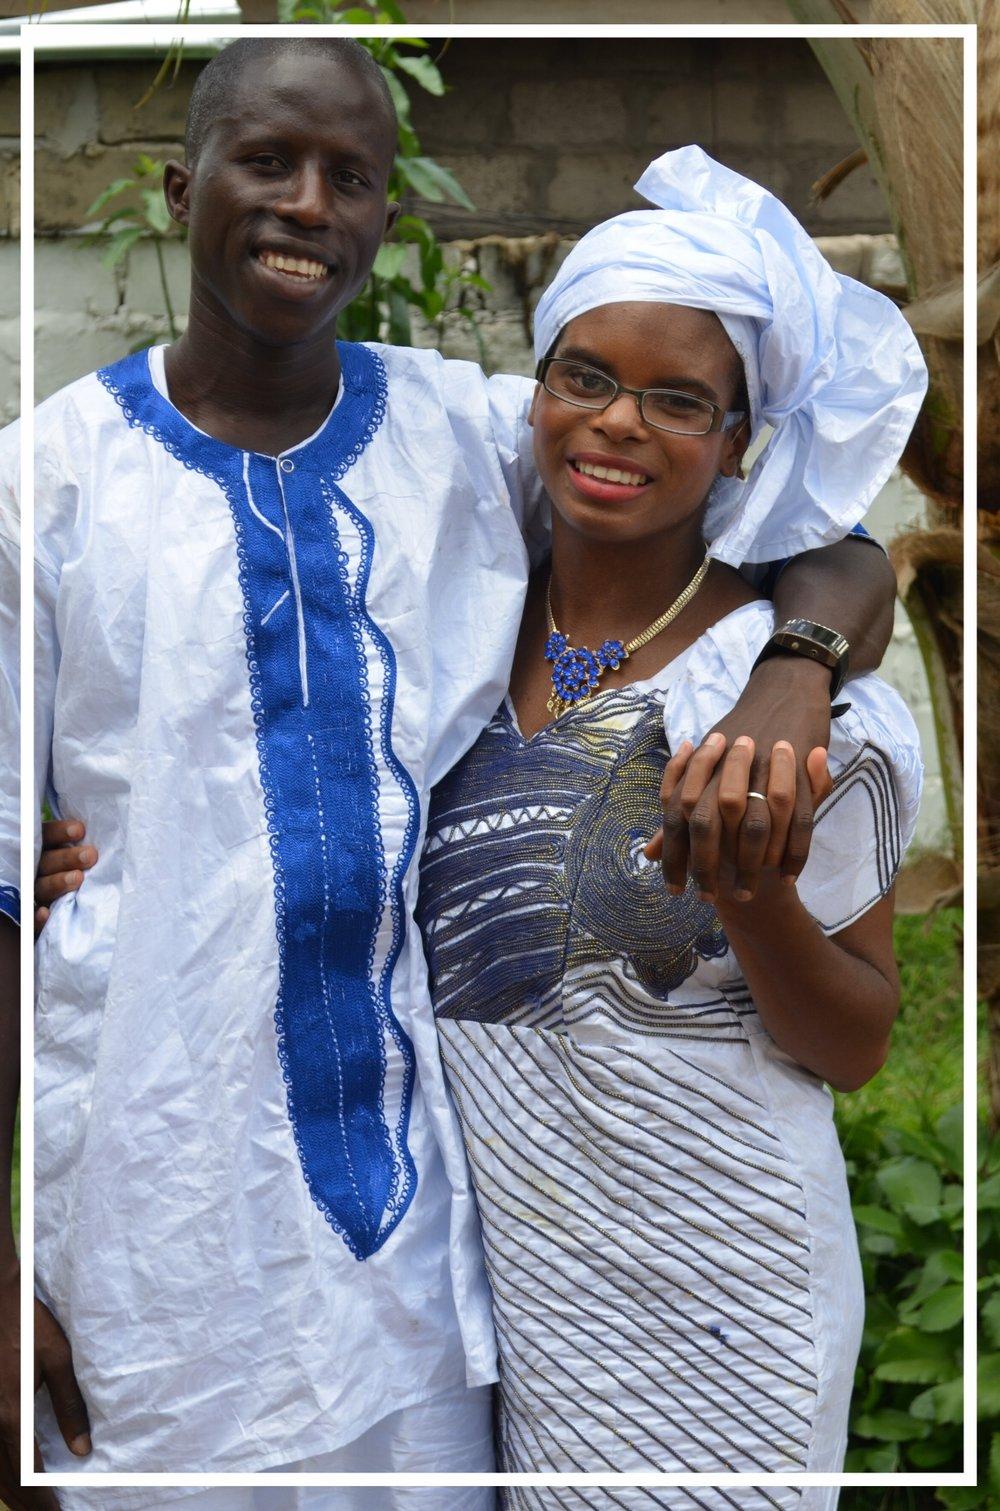 Demba Wedding Marriage Anniversary Picture taken The Gambia | Zaakirah Nayyar